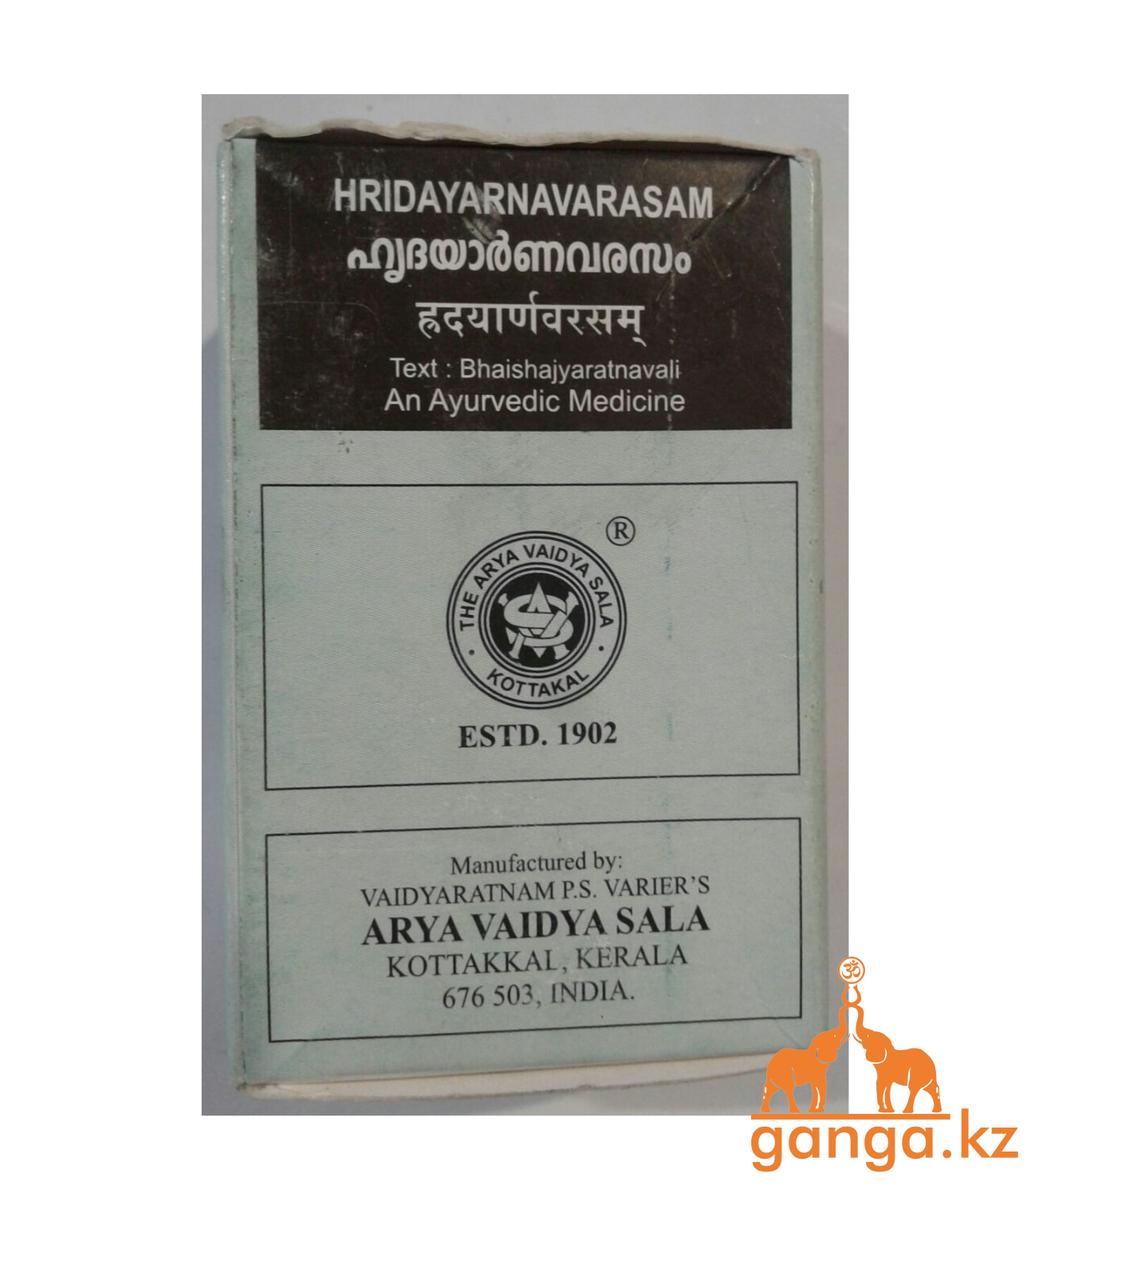 Хридаярнаварасам (Hridayarnavarasam ARYA VAIDYA SALA), 100 таб